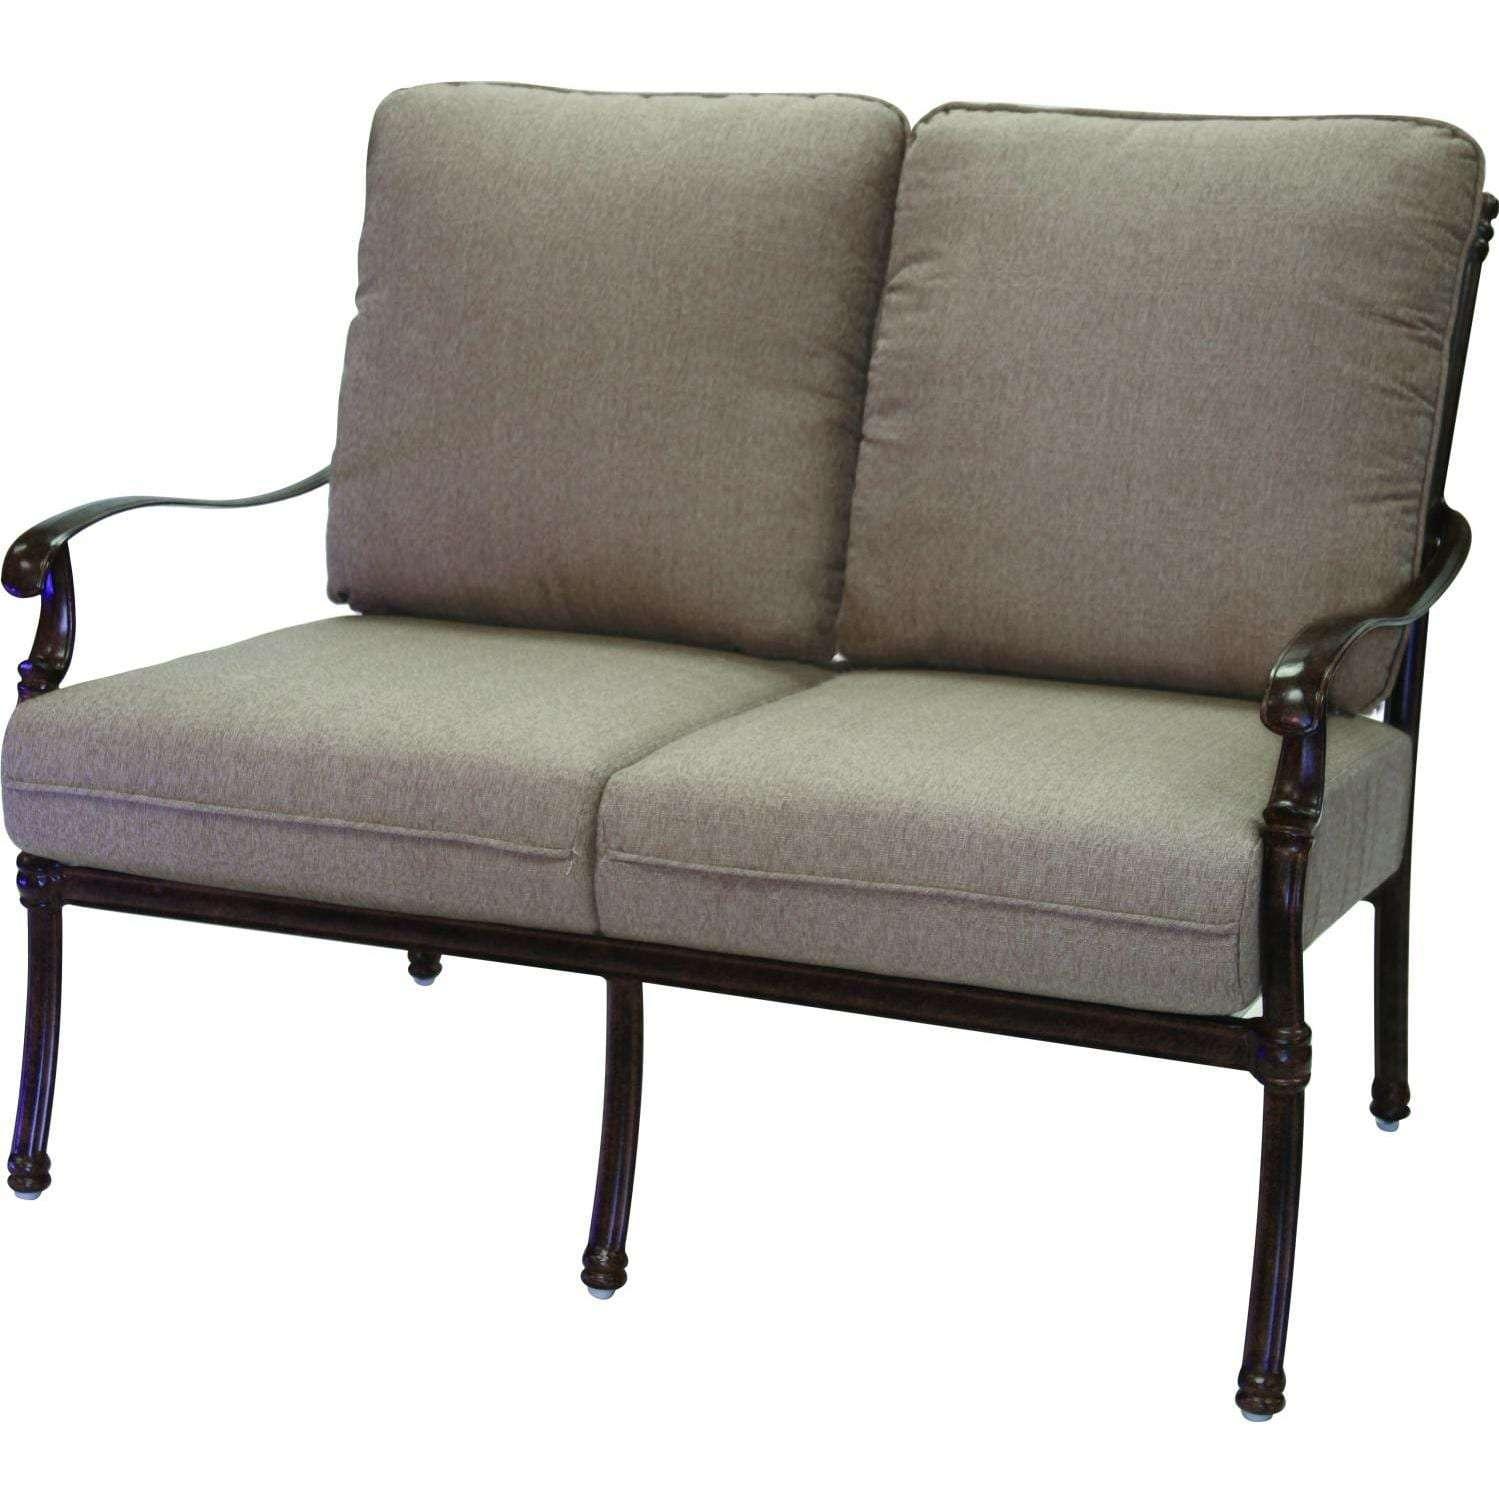 Darlee Florence 6 Piece Cast Aluminum Conversation Seating Set